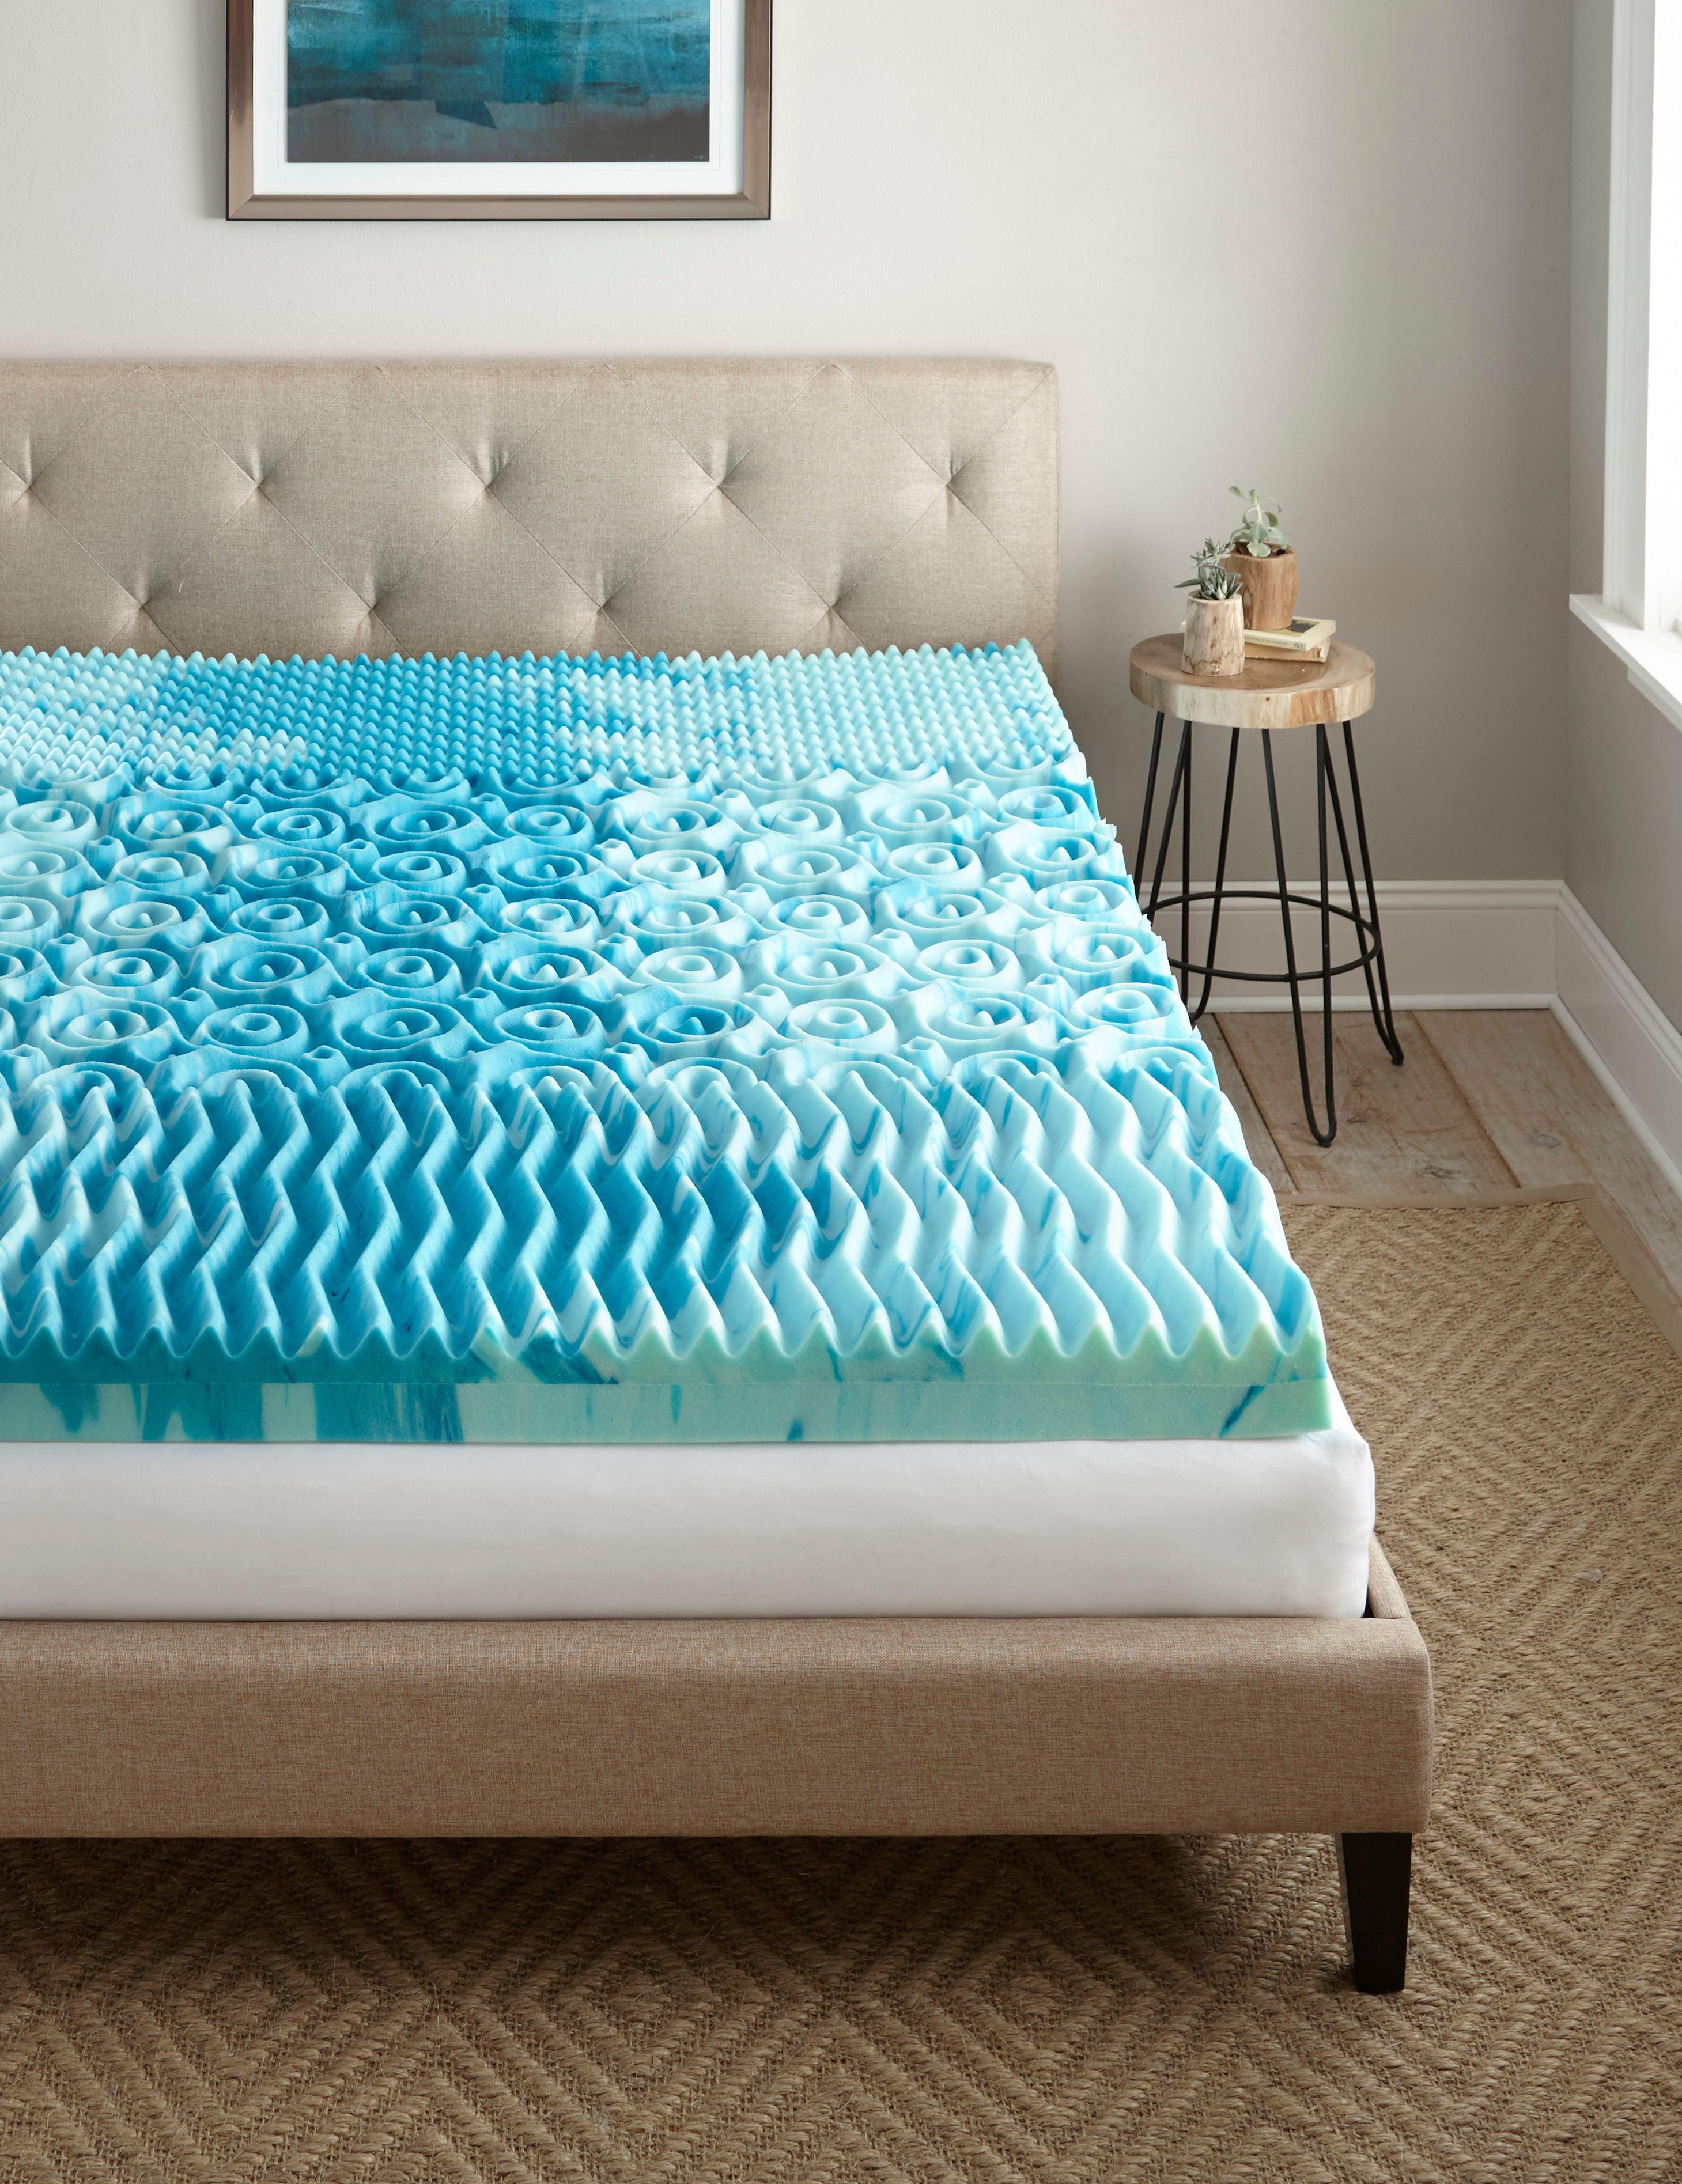 broyhill 4 inch cooling gellux memory foam gel mattress topper. Black Bedroom Furniture Sets. Home Design Ideas